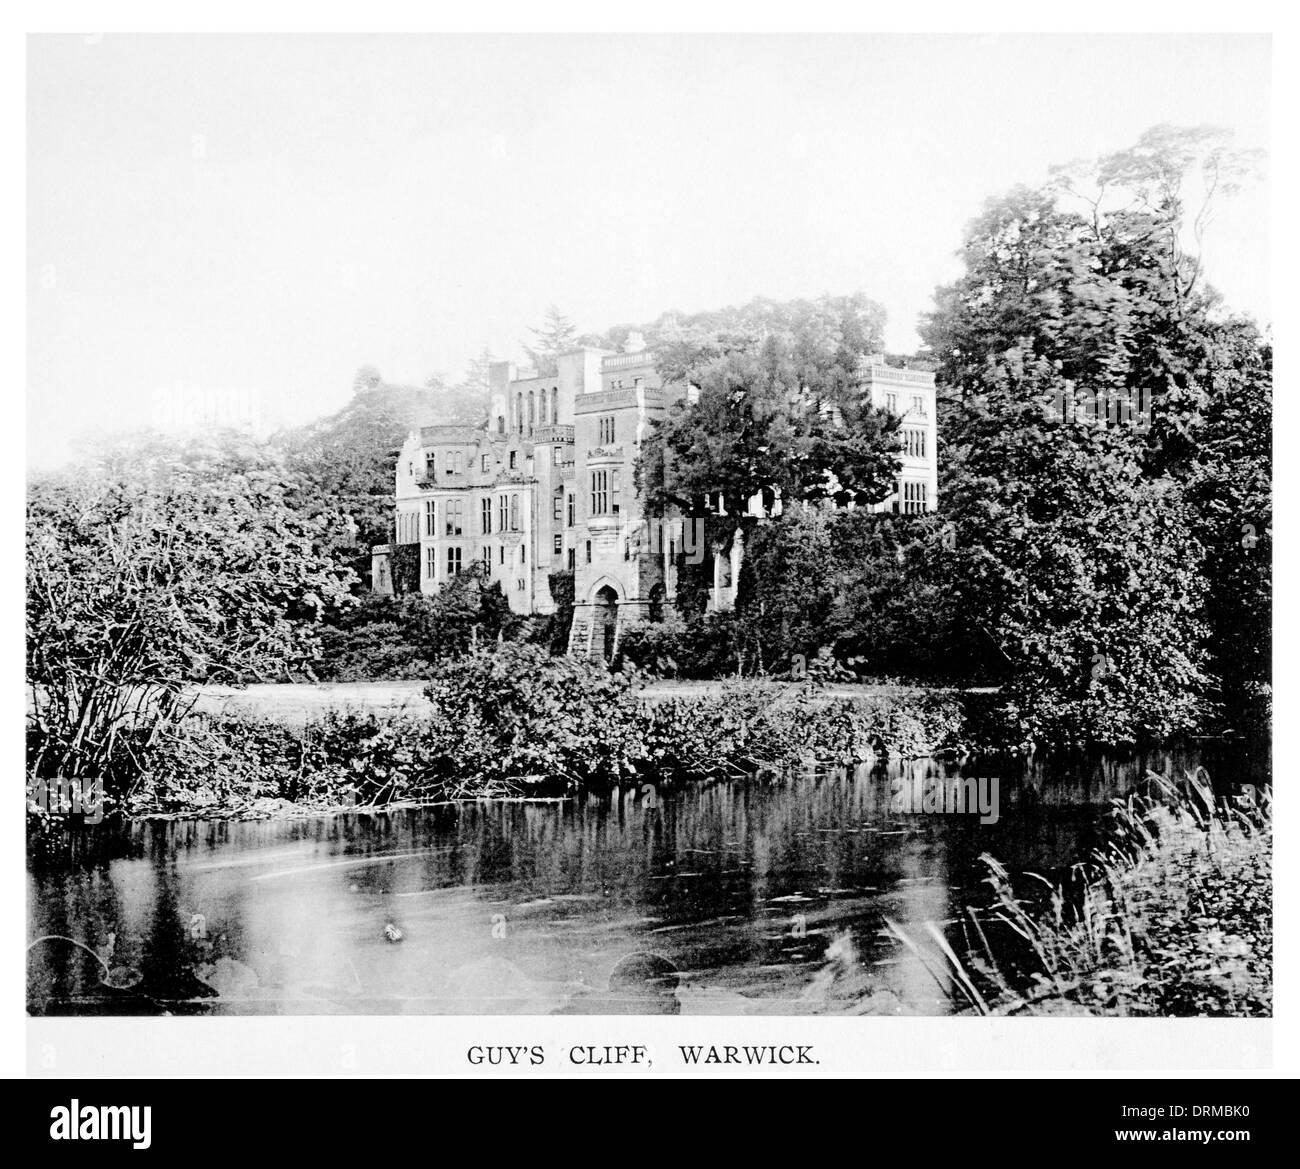 Guy's Cliff, Warwick Warwickshire Photographed Circa 1910 - Stock Image